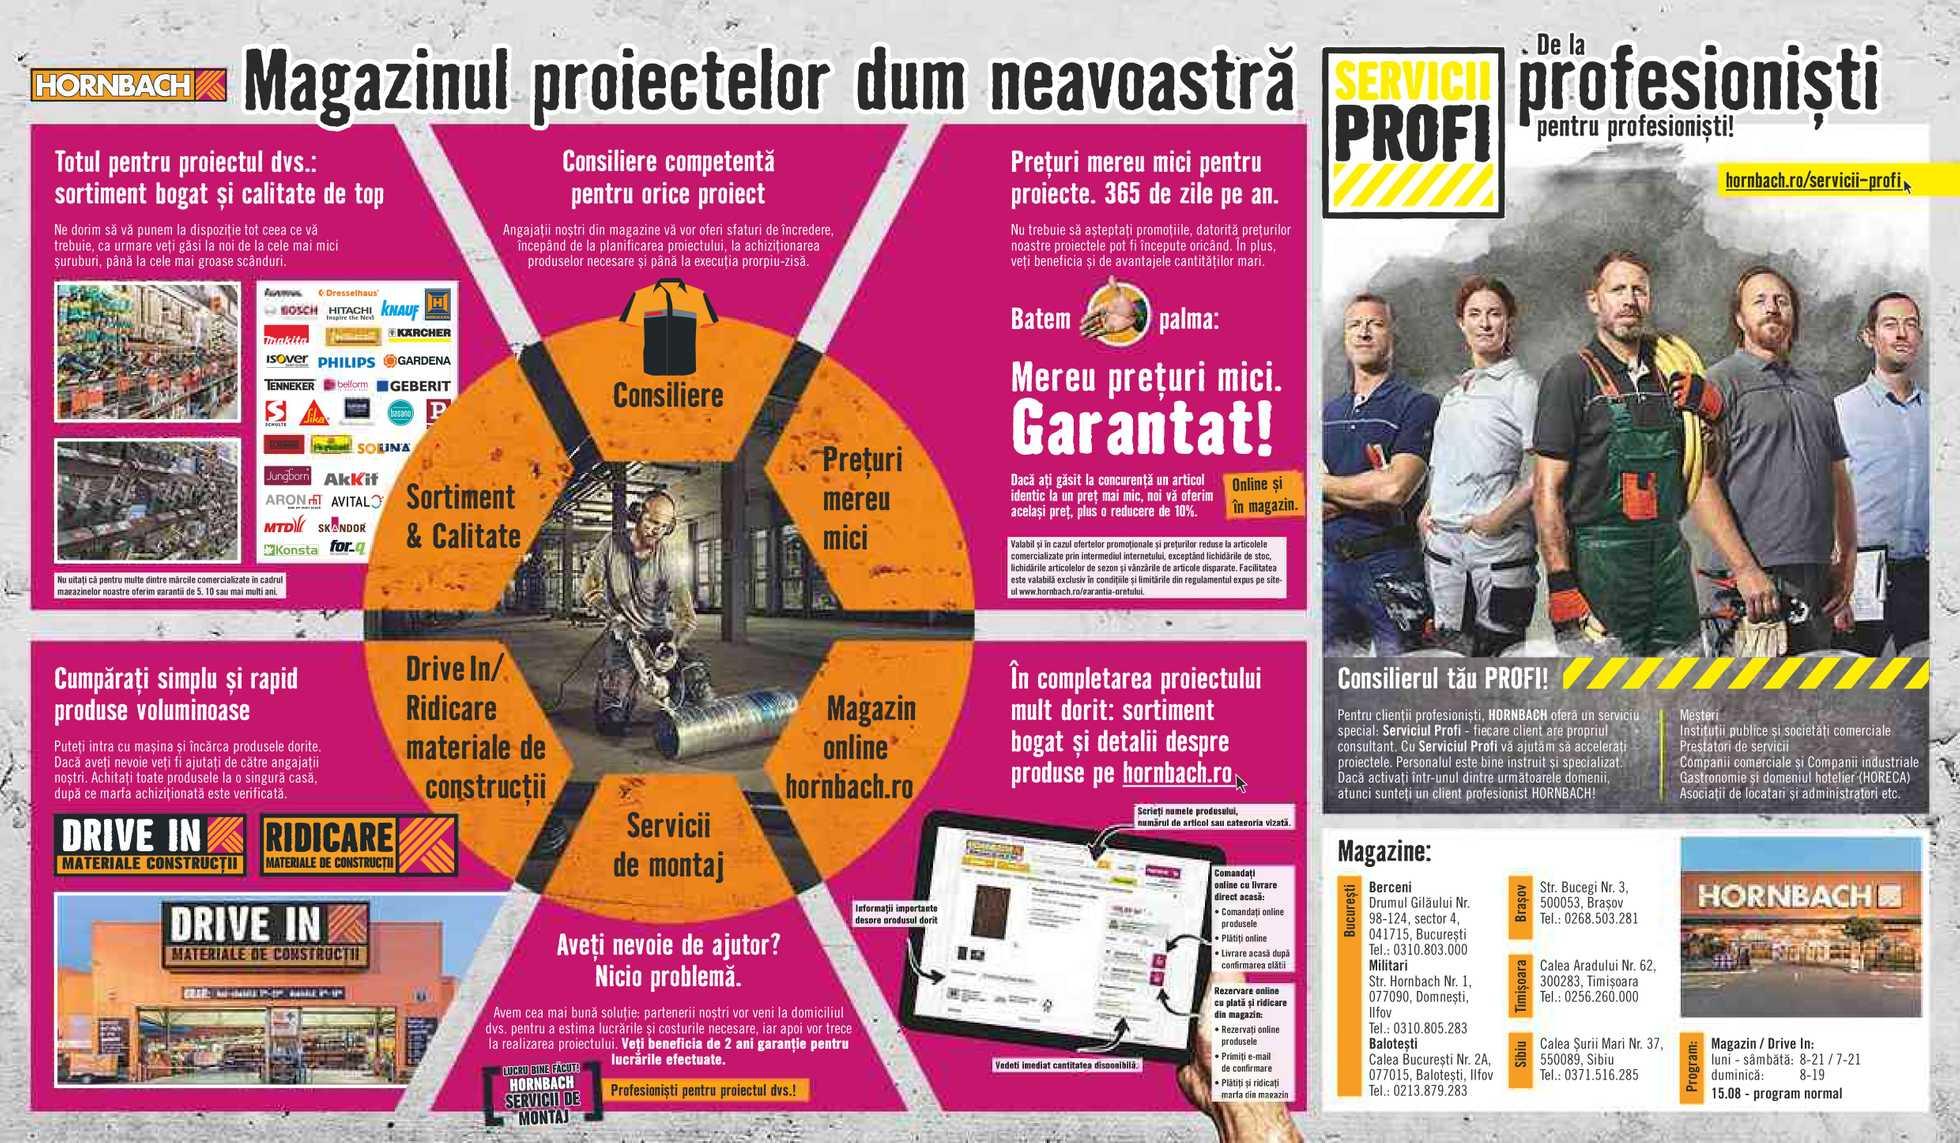 Hornbach - NEWSPAPERS_singleNewspaper_alt_presentationSliderItem_startAt 2019-07-30 - pagină 2